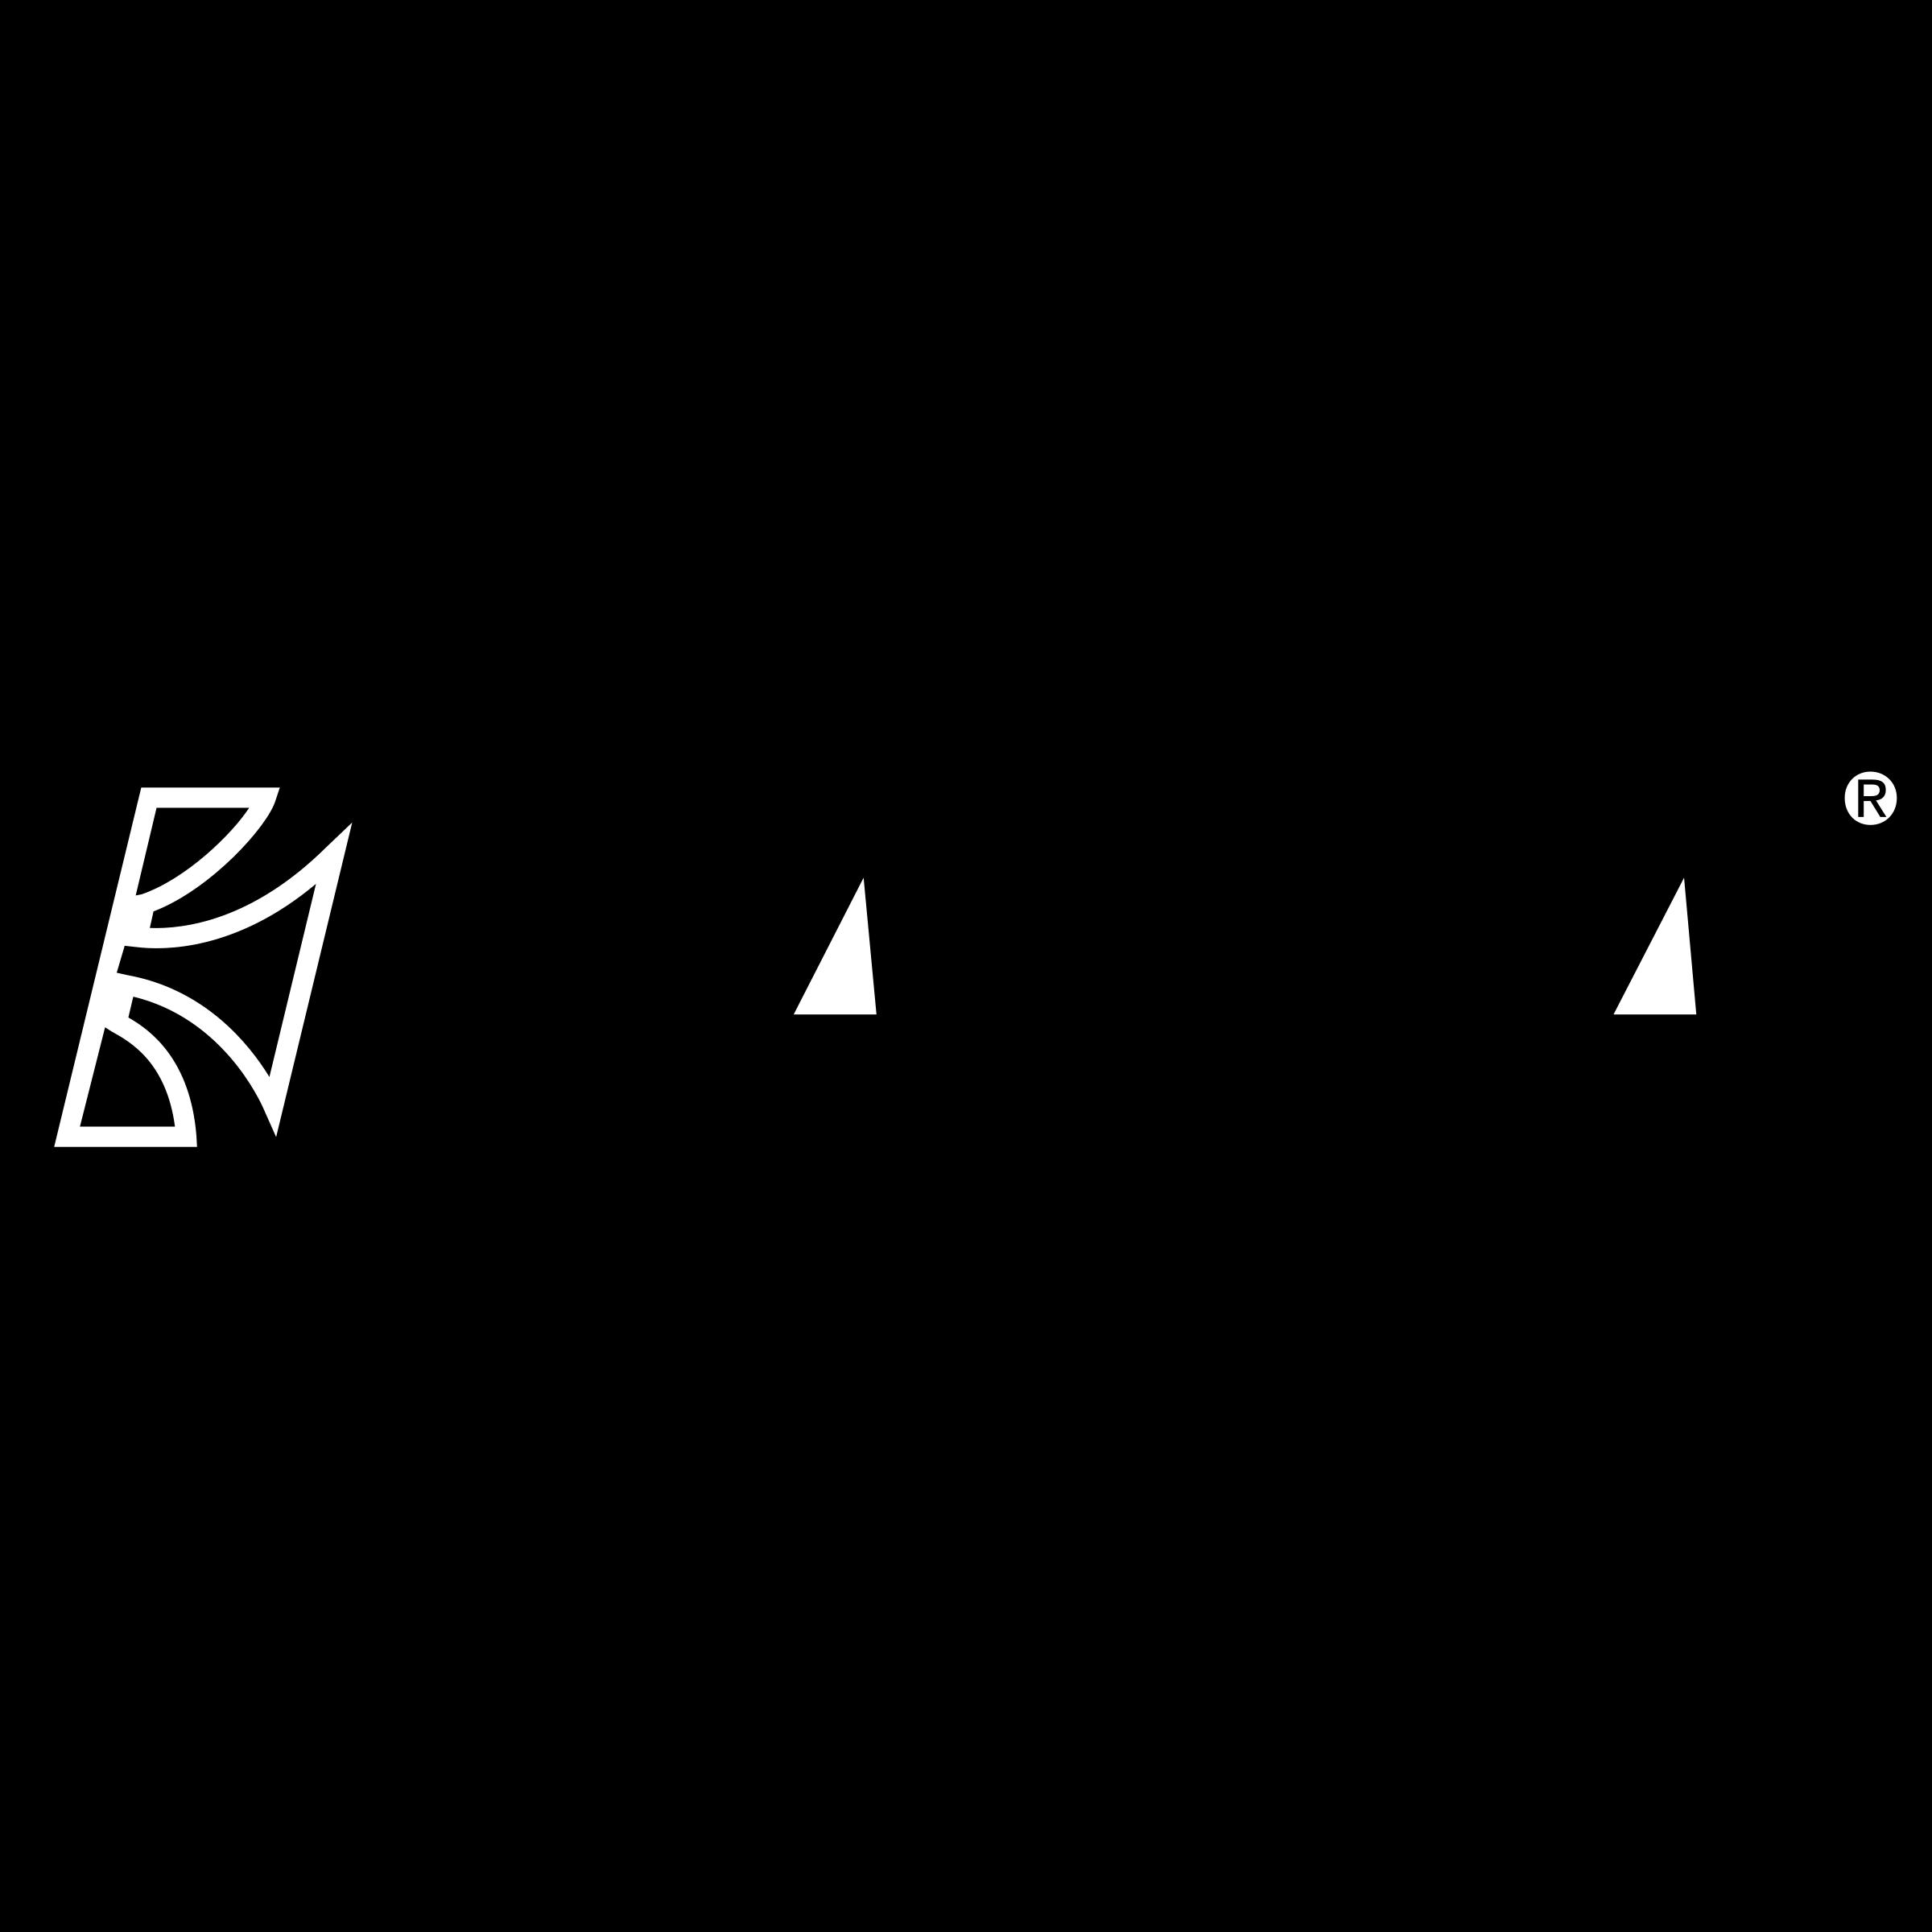 Tama Logo PNG Transparent & SVG Vector - Freebie Supply